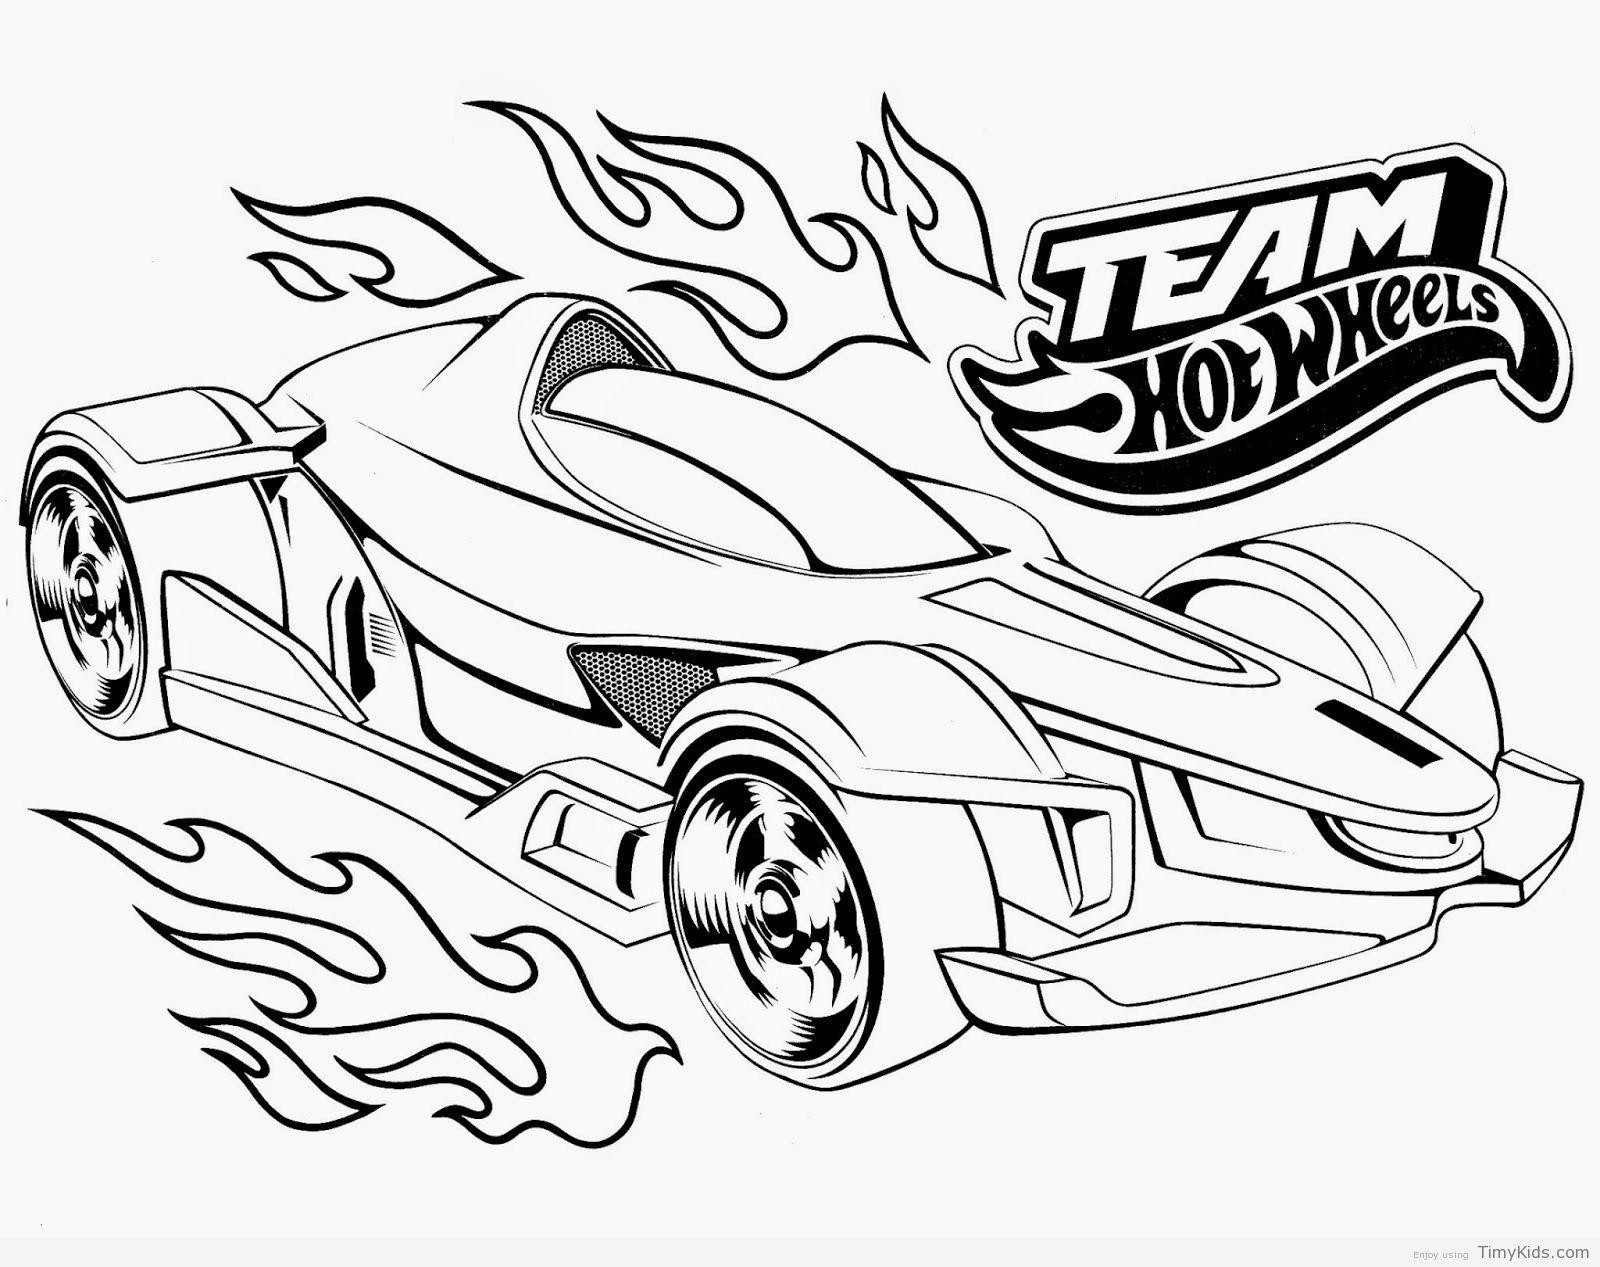 Lightning Mcqueen Malvorlage Frisch Awesome Colouring Disney Cars Genial Cars Ausmalbilder Lightning Bild